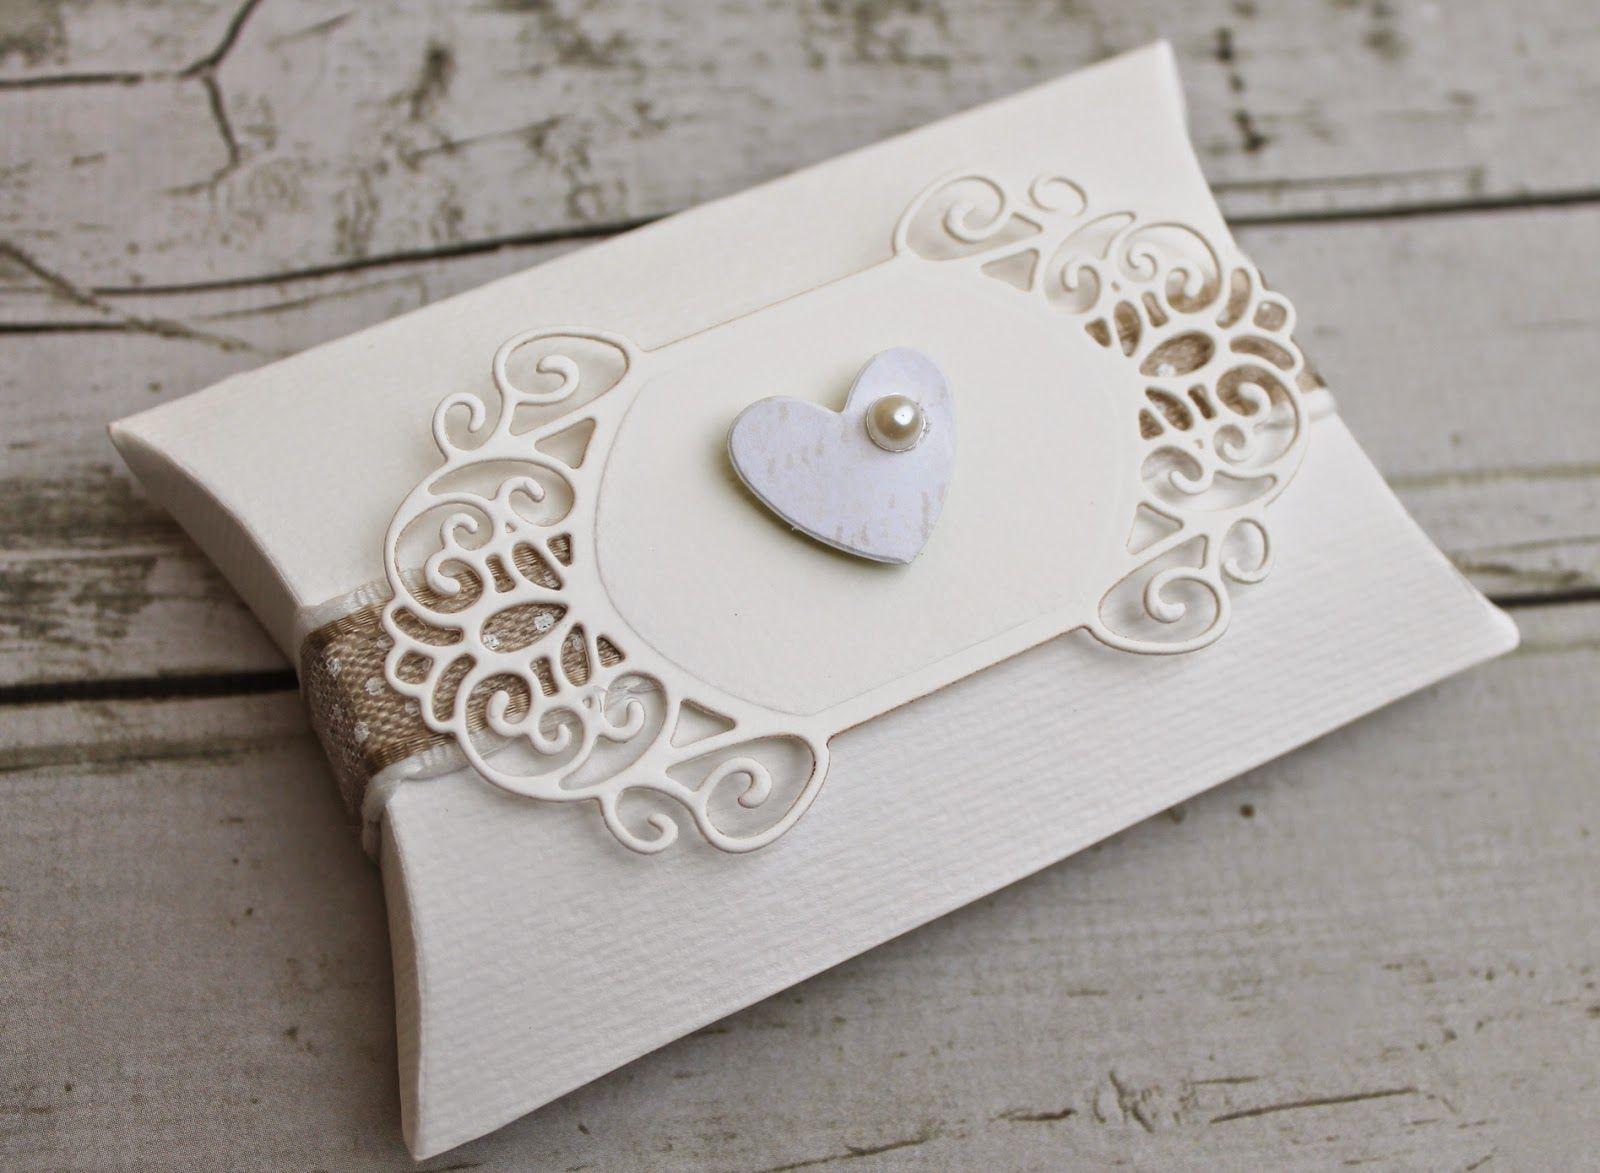 Pin by MARIA GIOVANNA on Pillow box | Pinterest | Confetti, Pillow ...